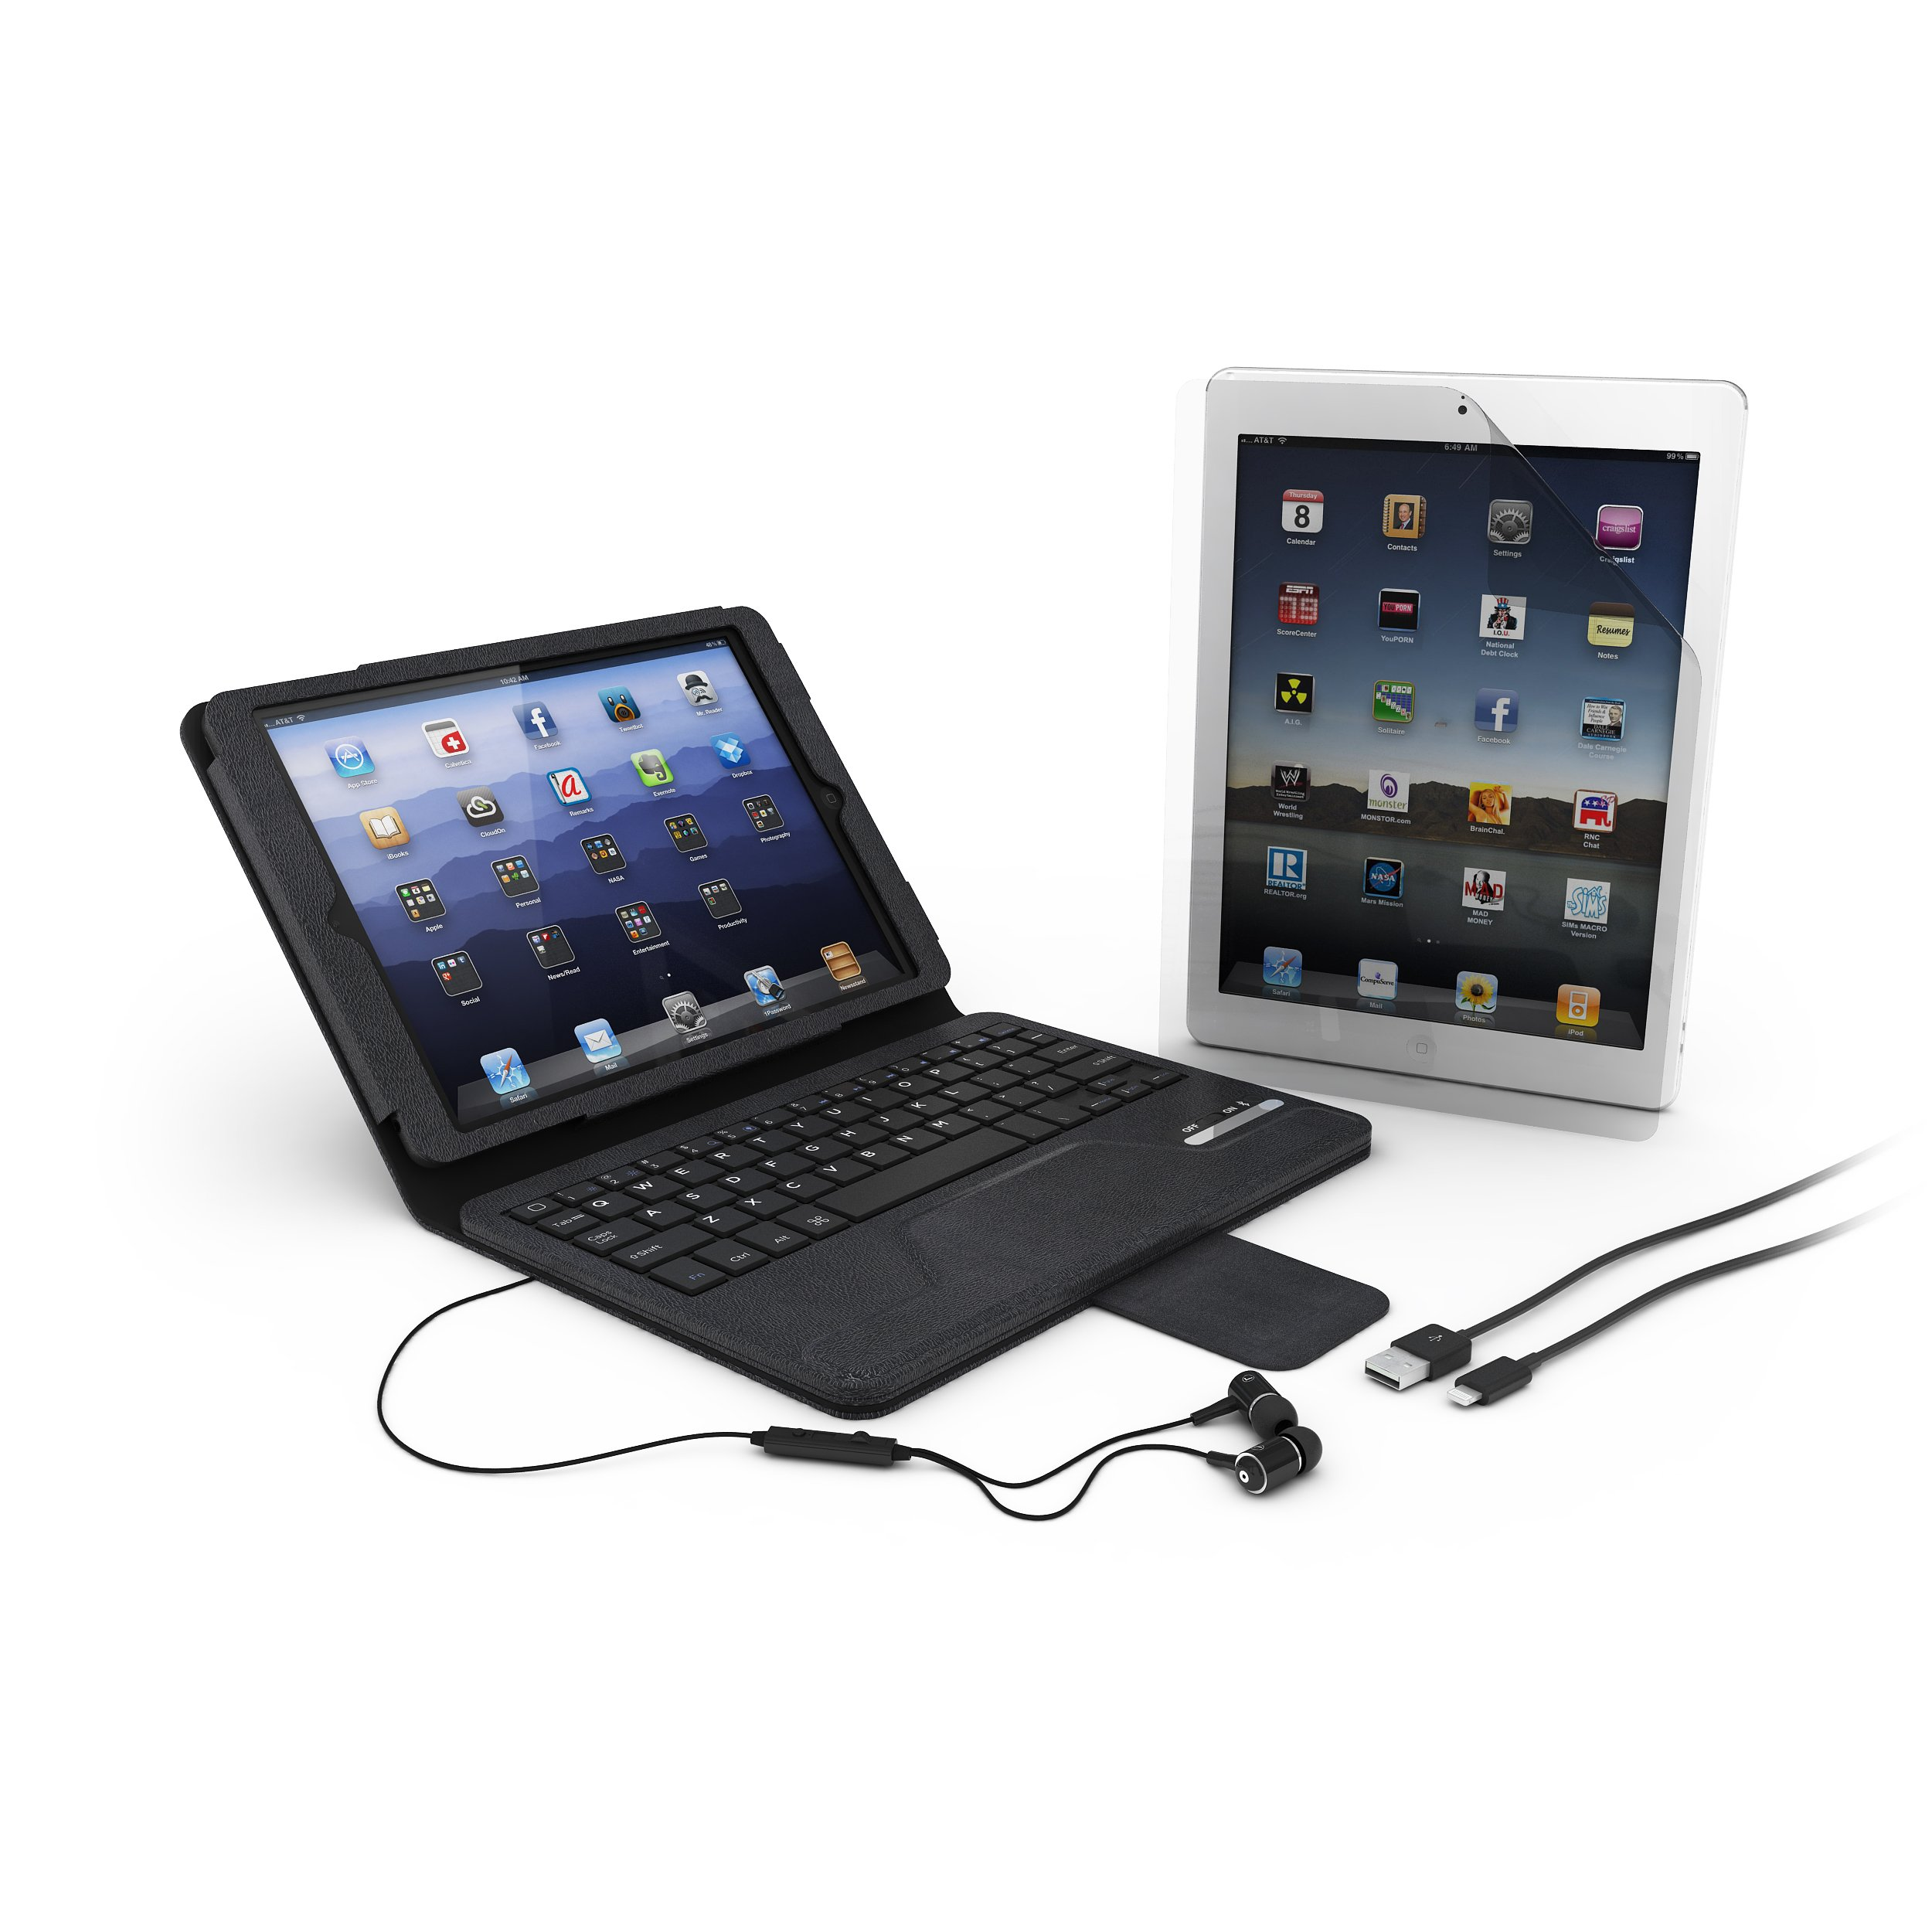 Hip Street iPad Air Essentials Bluetooth Keyboard Bundle (IPDAIR-BUN4) by Hipstreet